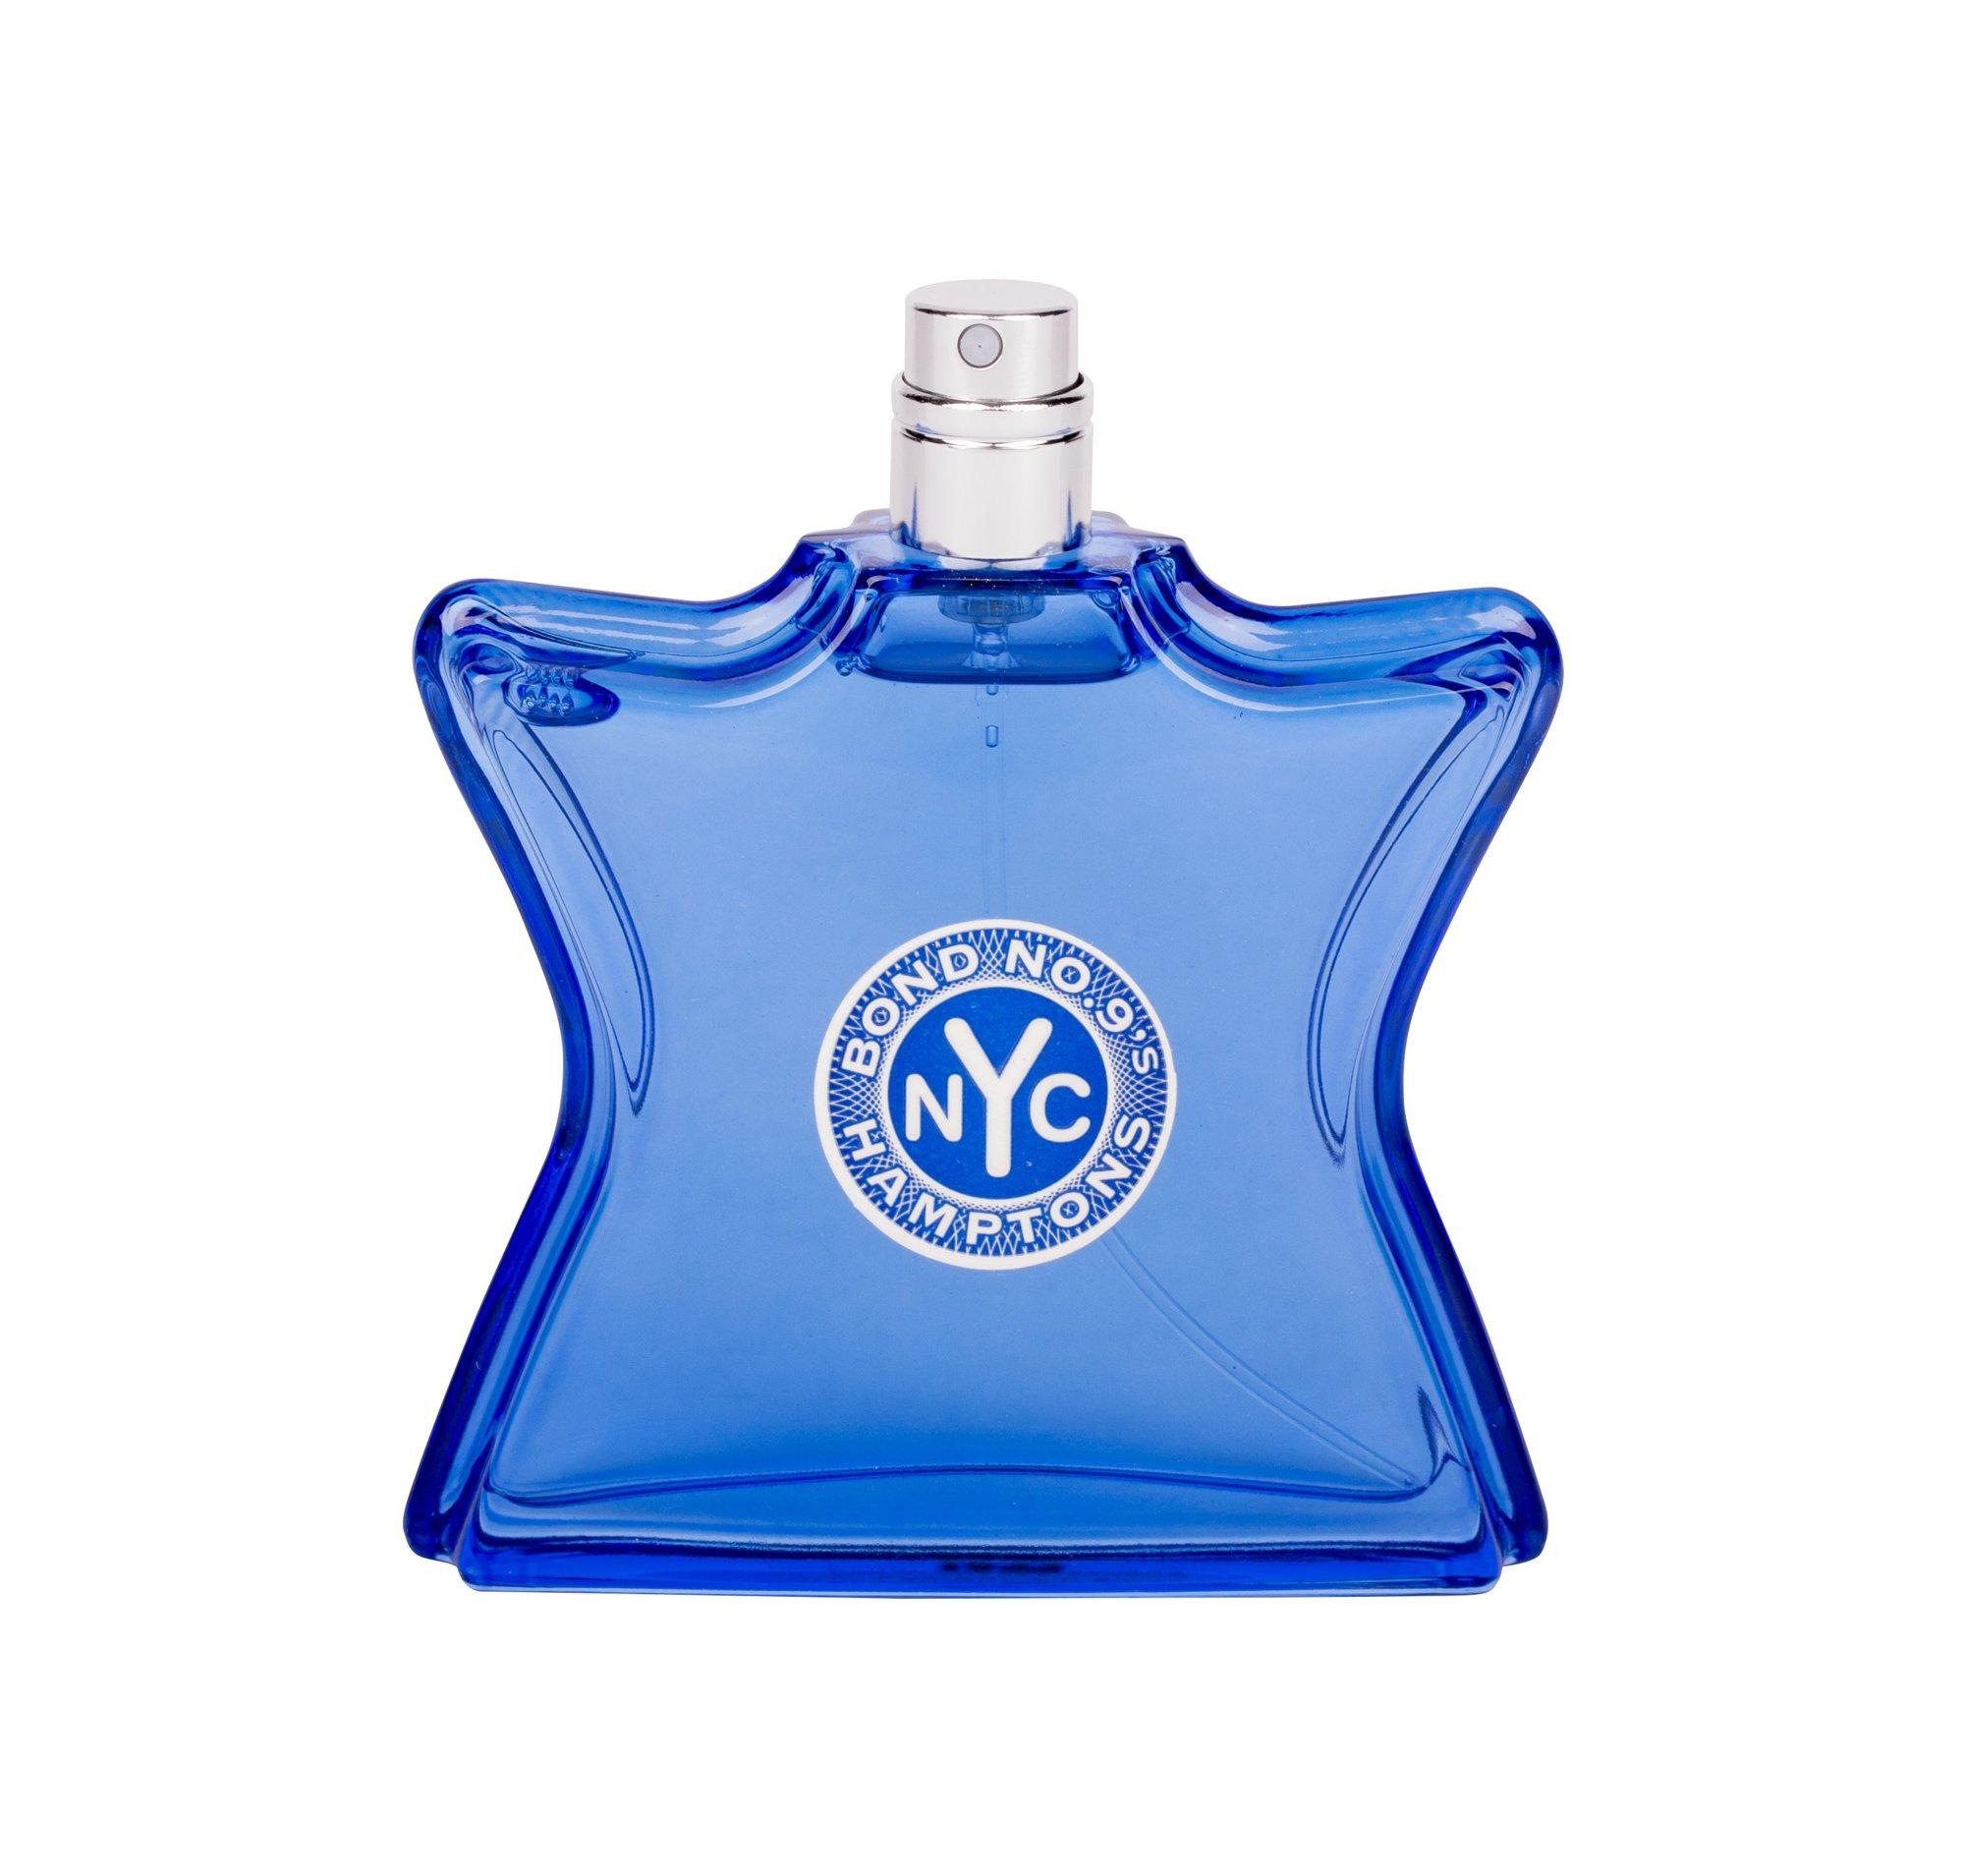 Bond No. 9 Hamptons Eau de Parfum 50ml